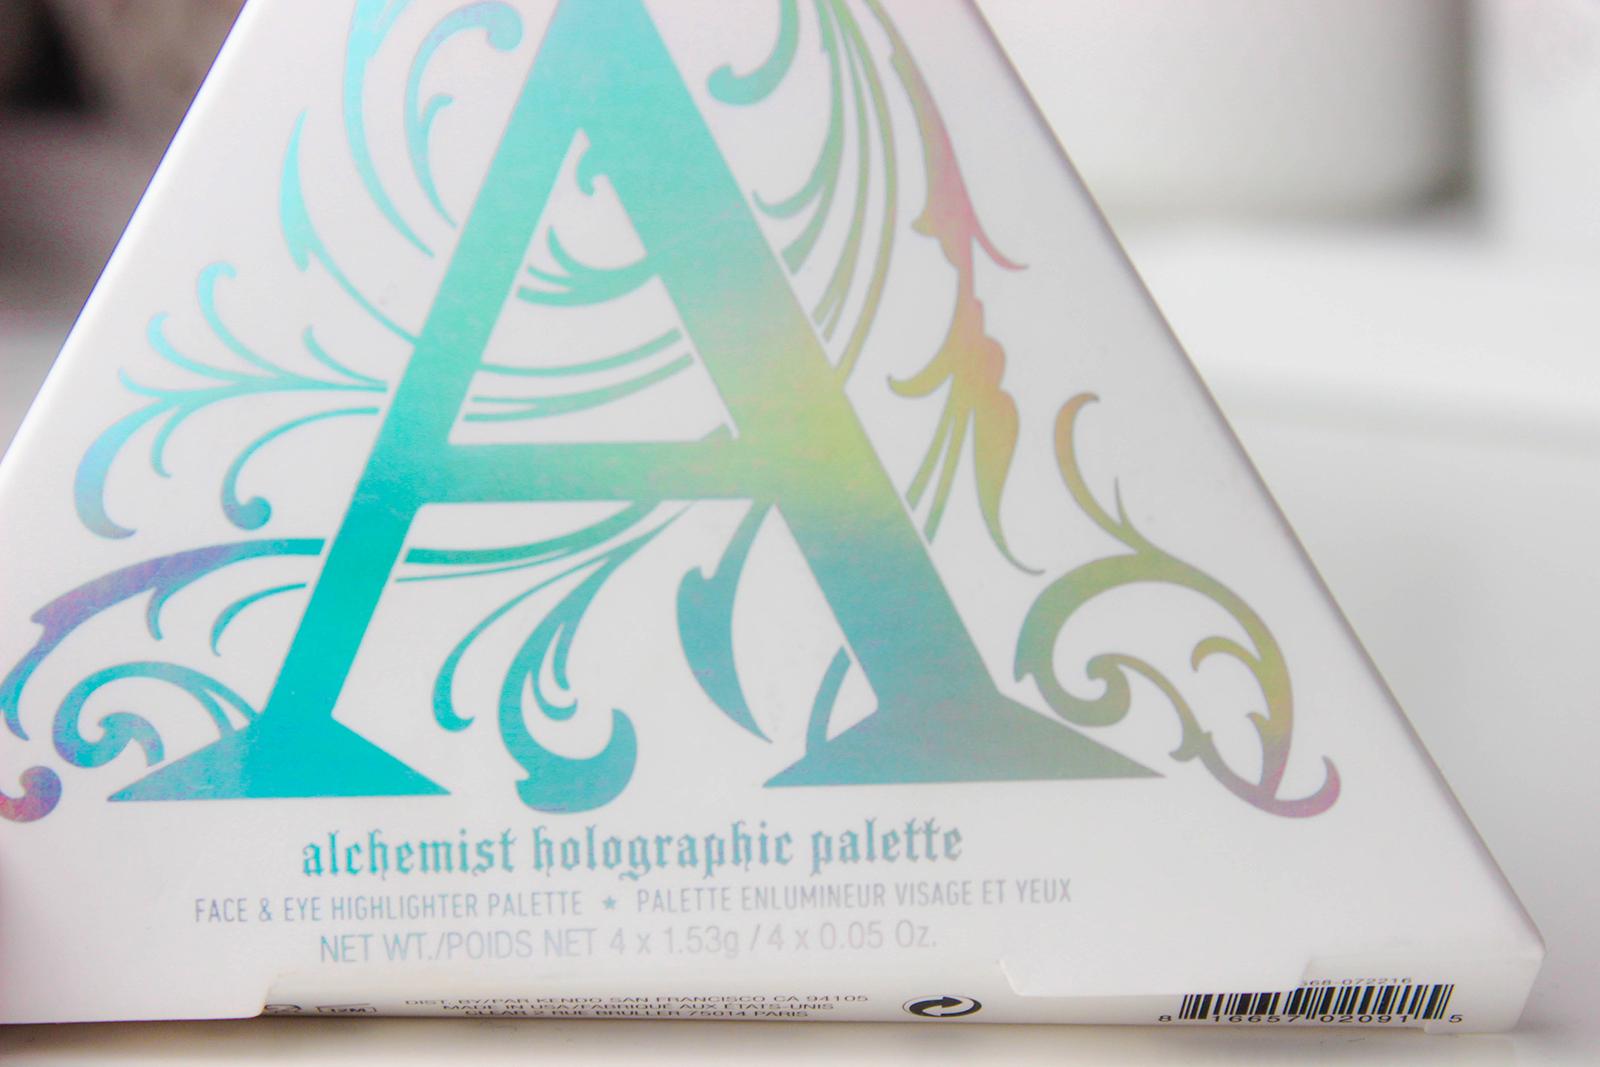 KatVonD-Alchemist-Holographic-Palette-8